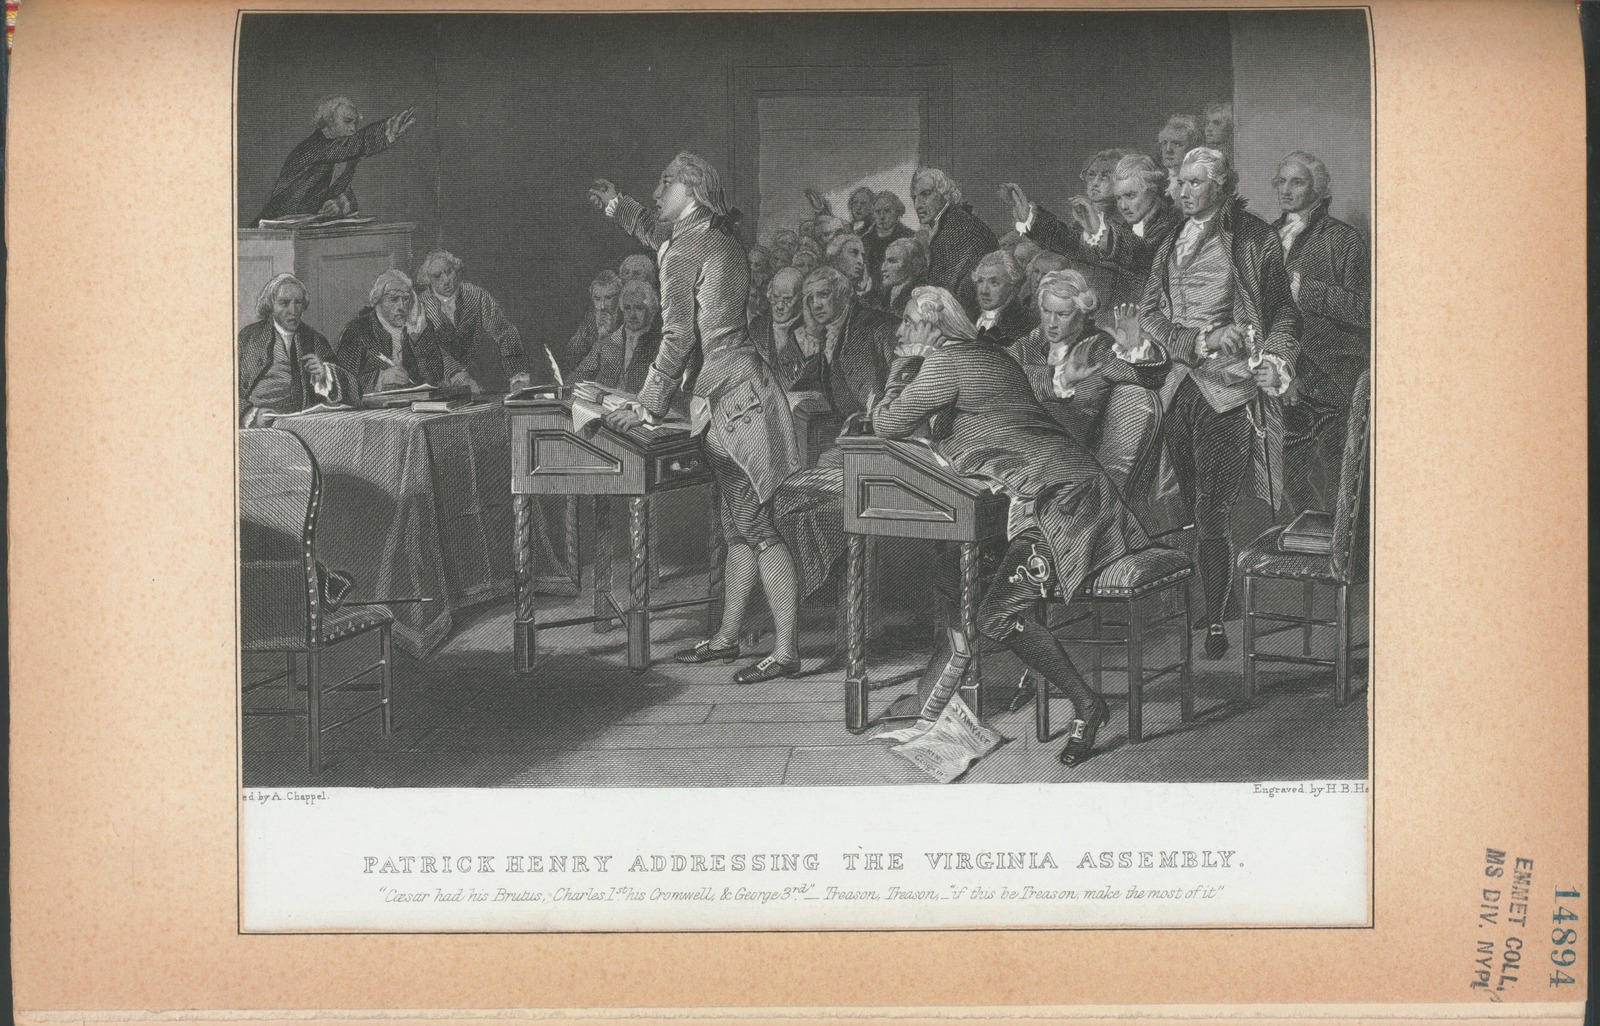 Patrick Henry addressing the Virginia Assembly.